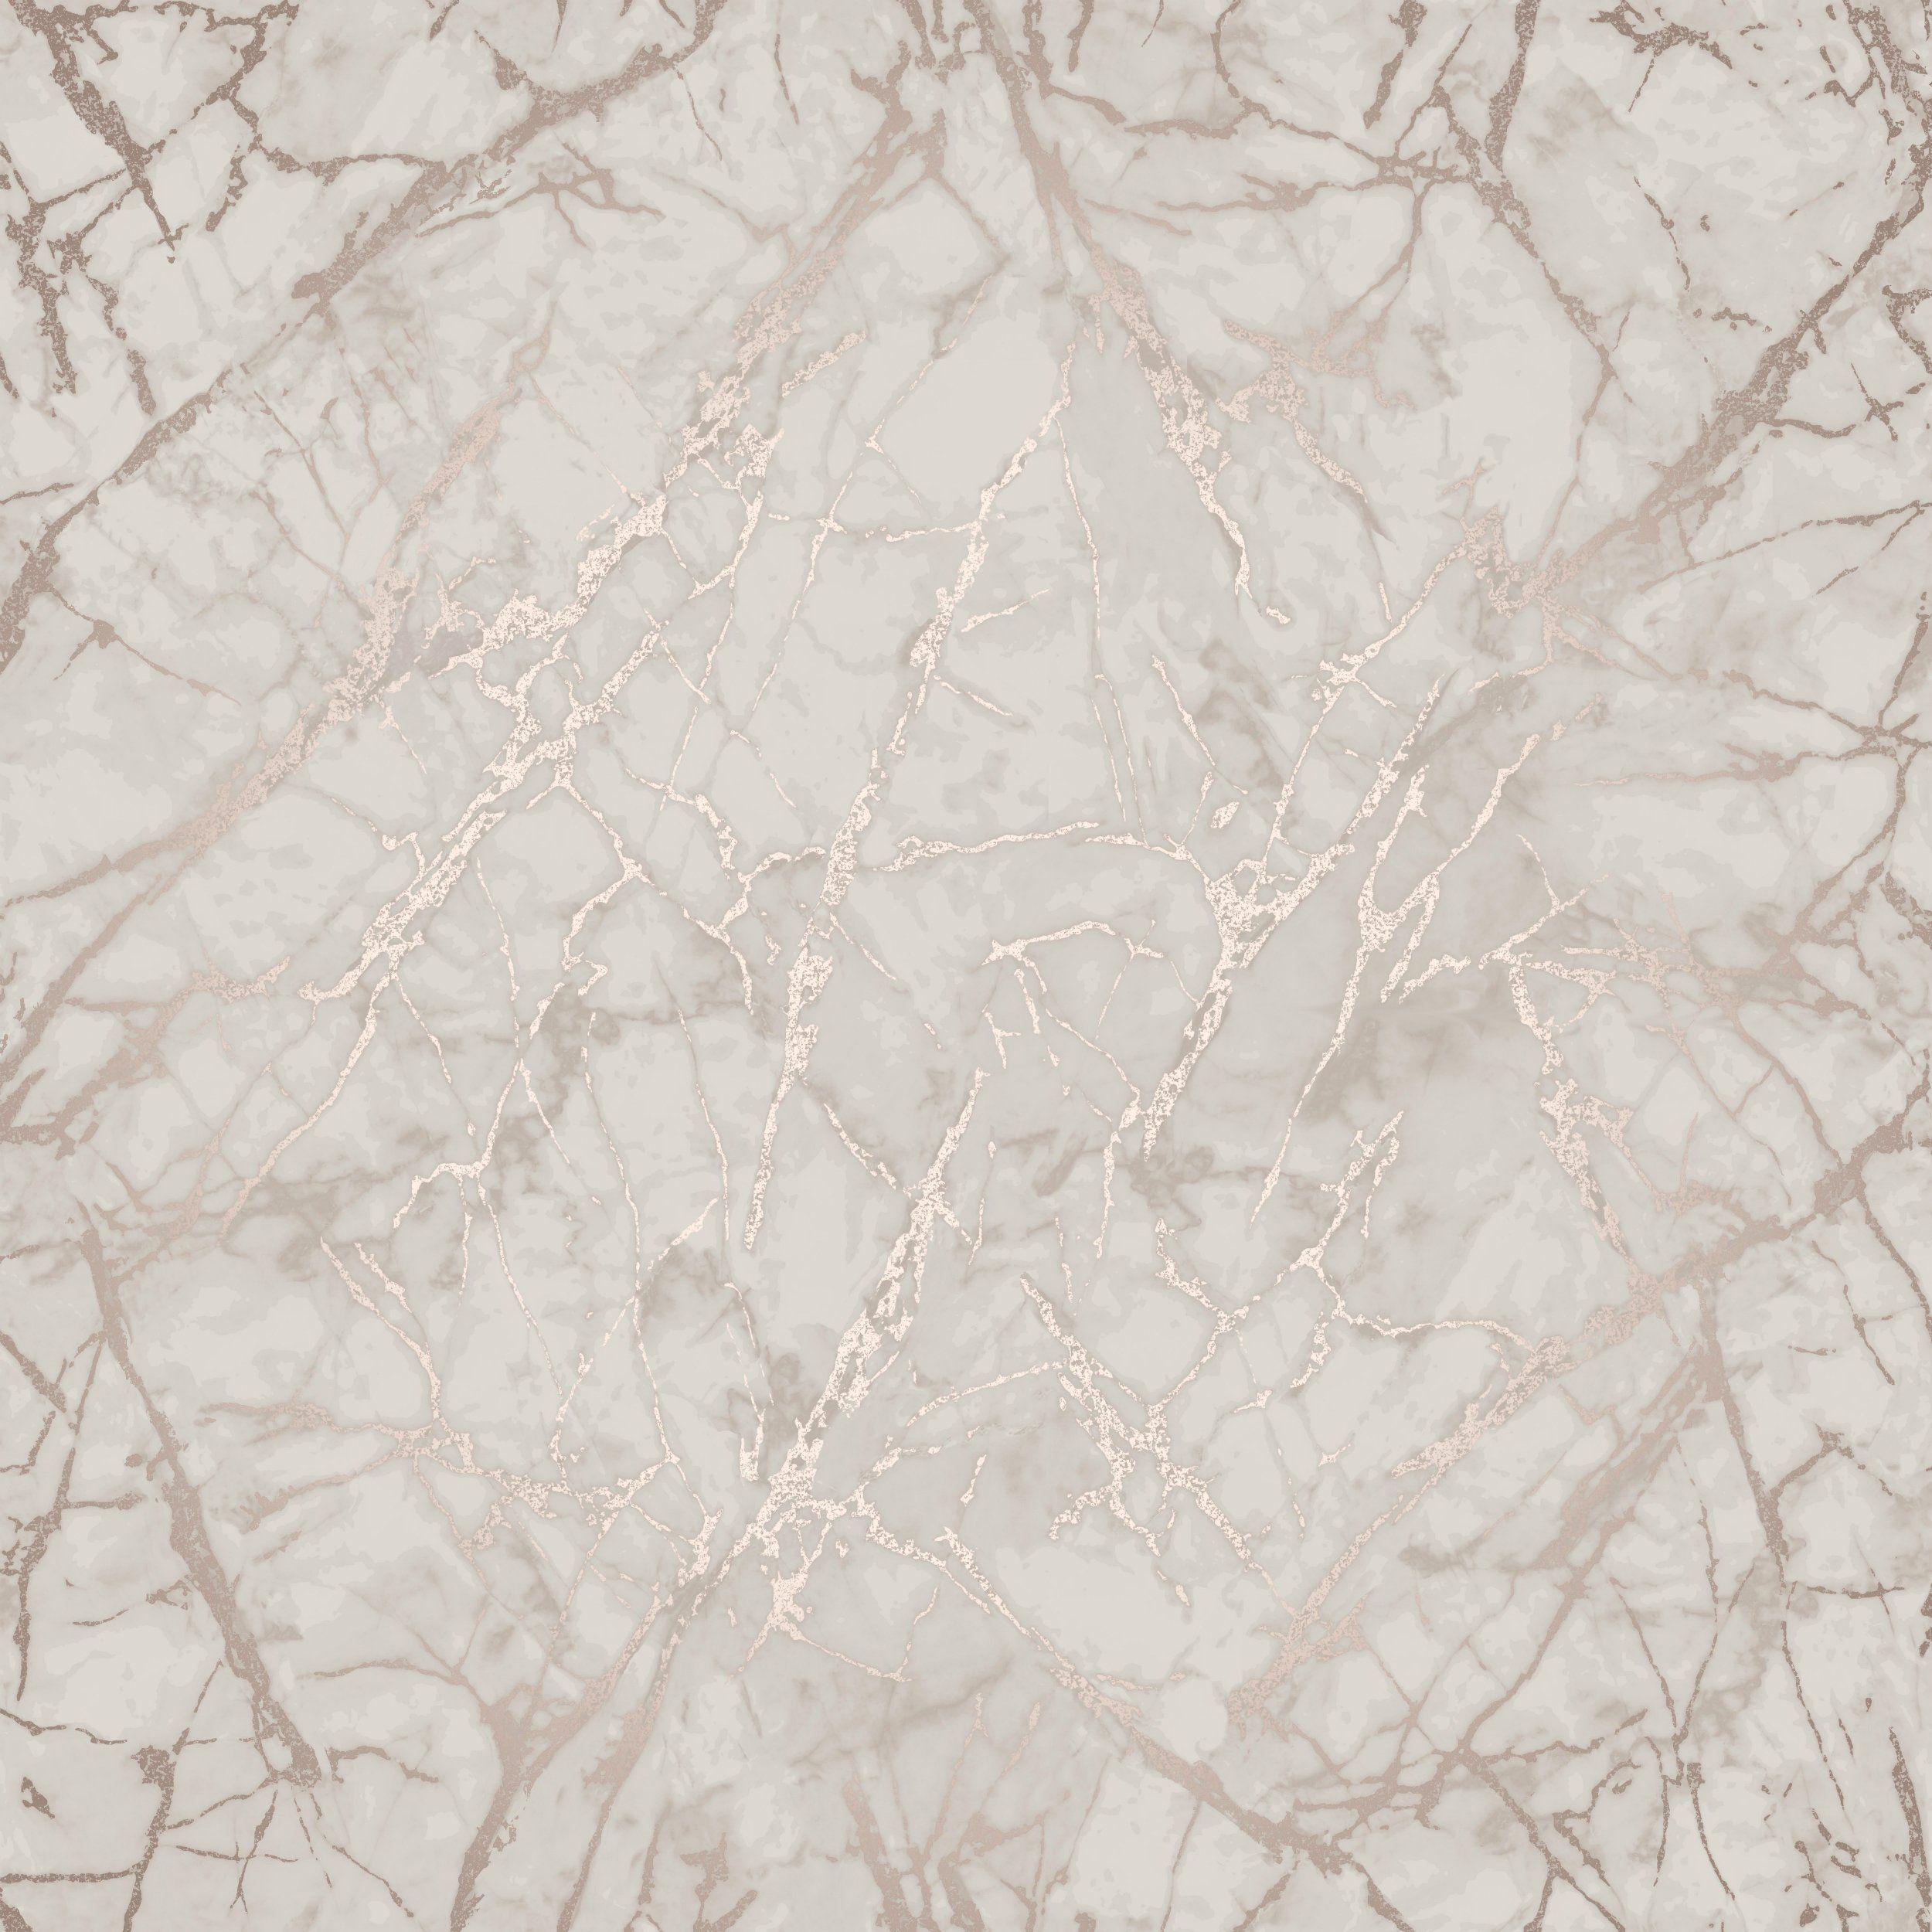 Metallic Marble Blush/Rose Gold Lashes in 2019 Gold